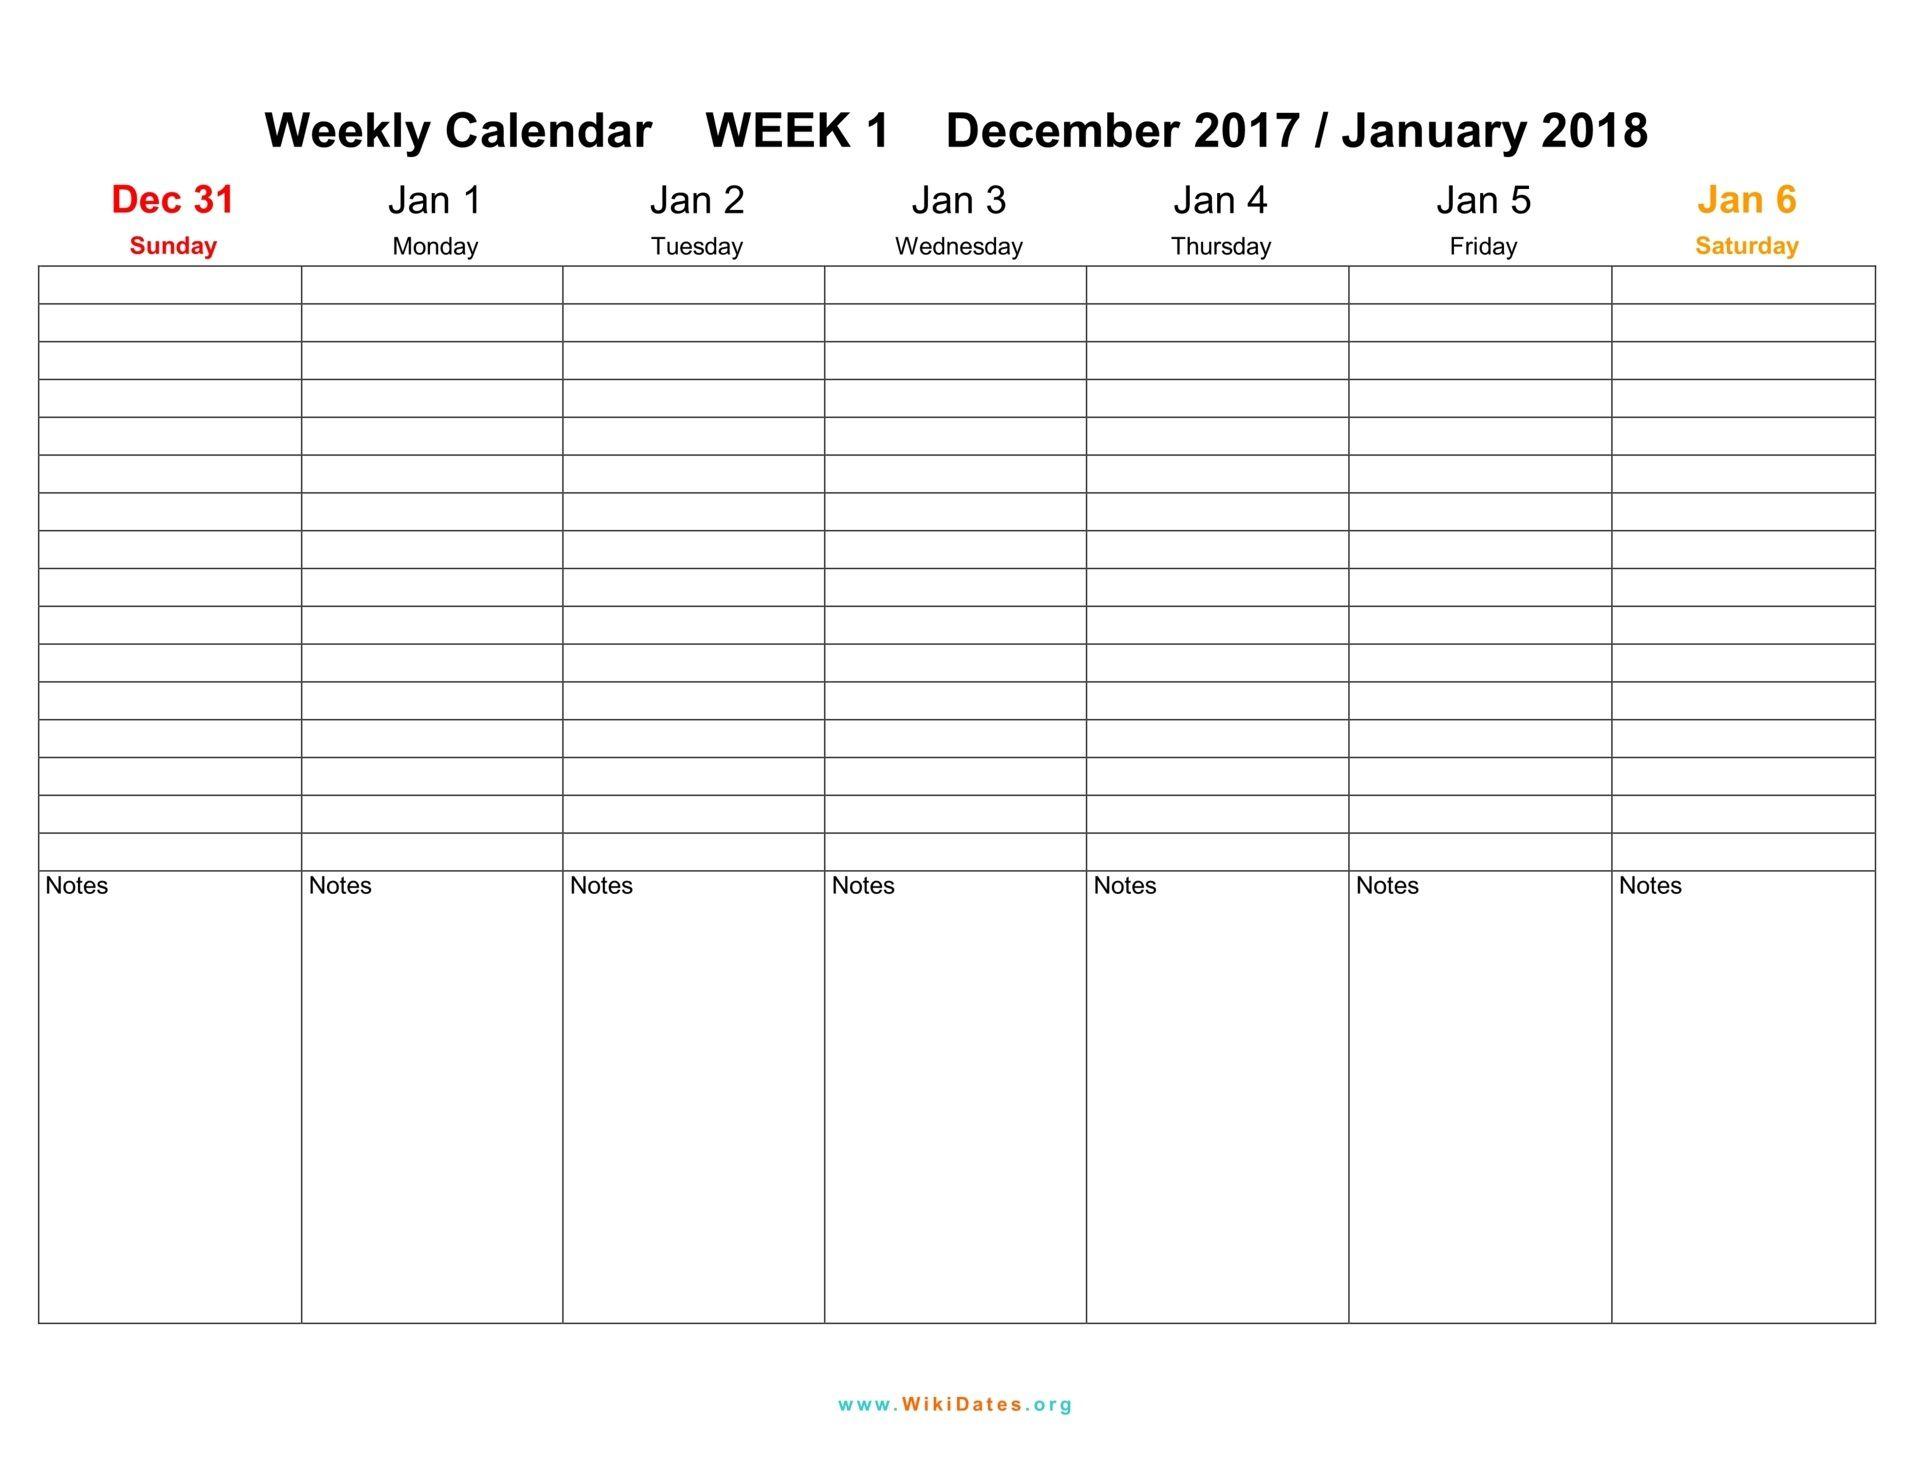 007 Breathtaking Free Printable Weekly Calendar Template 2018 Image Full